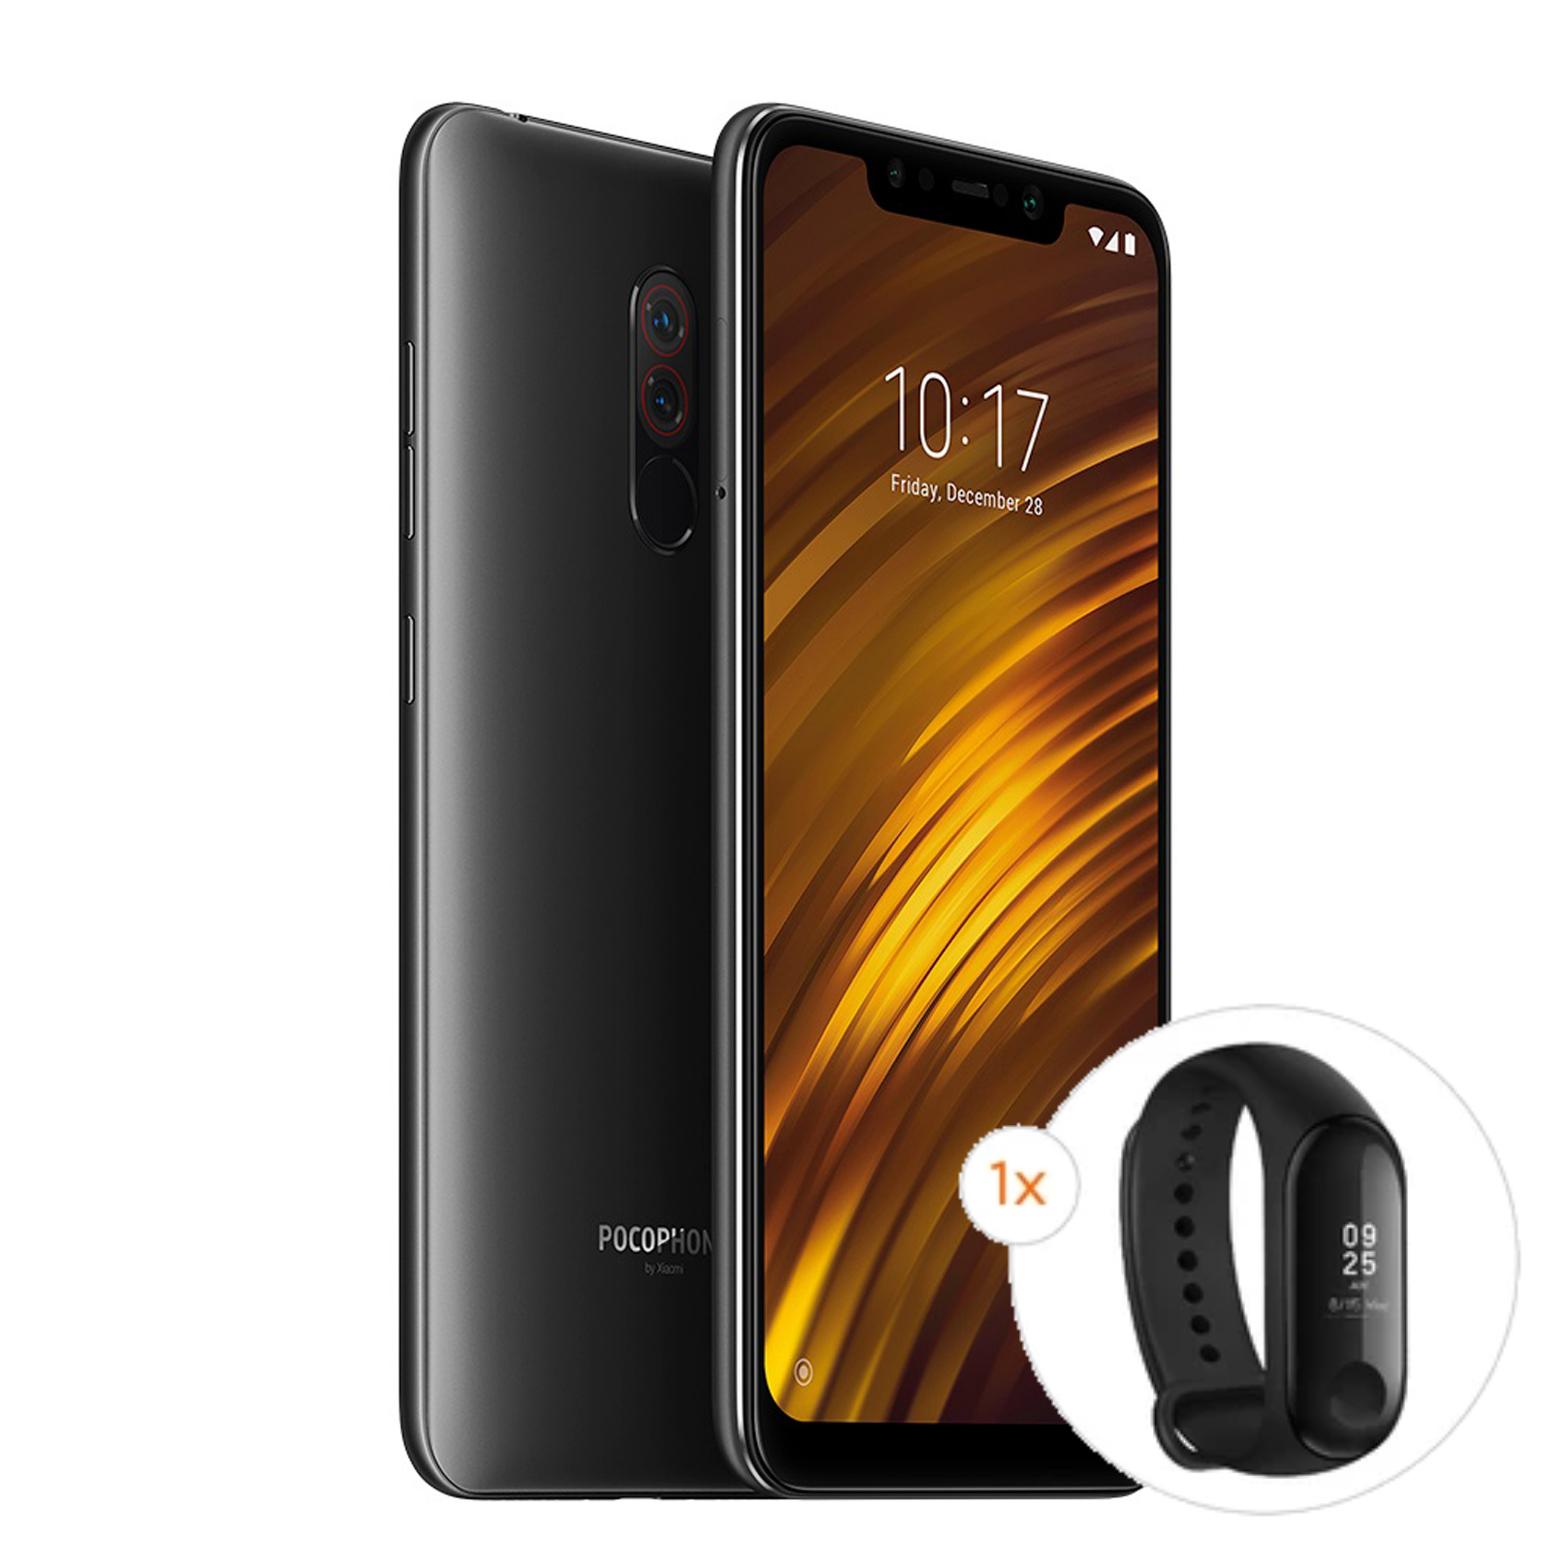 [Xiaomi Store] Xiaomi Pocophone 128/6GB - Snapdragon 845 - 4000mAh Akku + Xiaomi Mi Band 3 für 241,05€